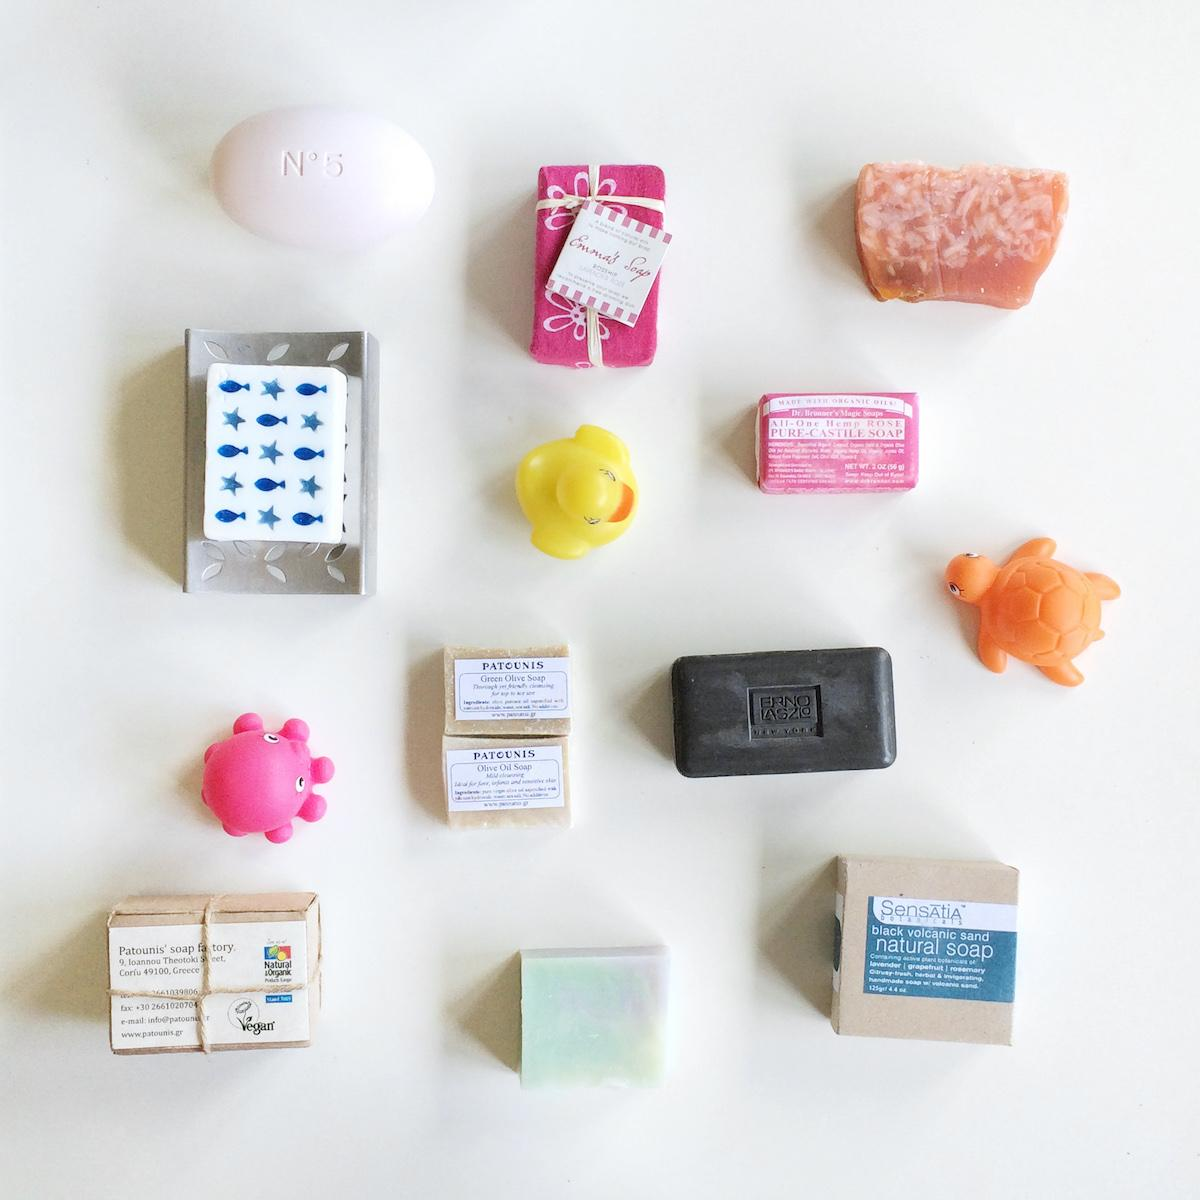 naravna-trda-mila--beautyfullblog-chanel-laszlo-drbroner-emma-soap